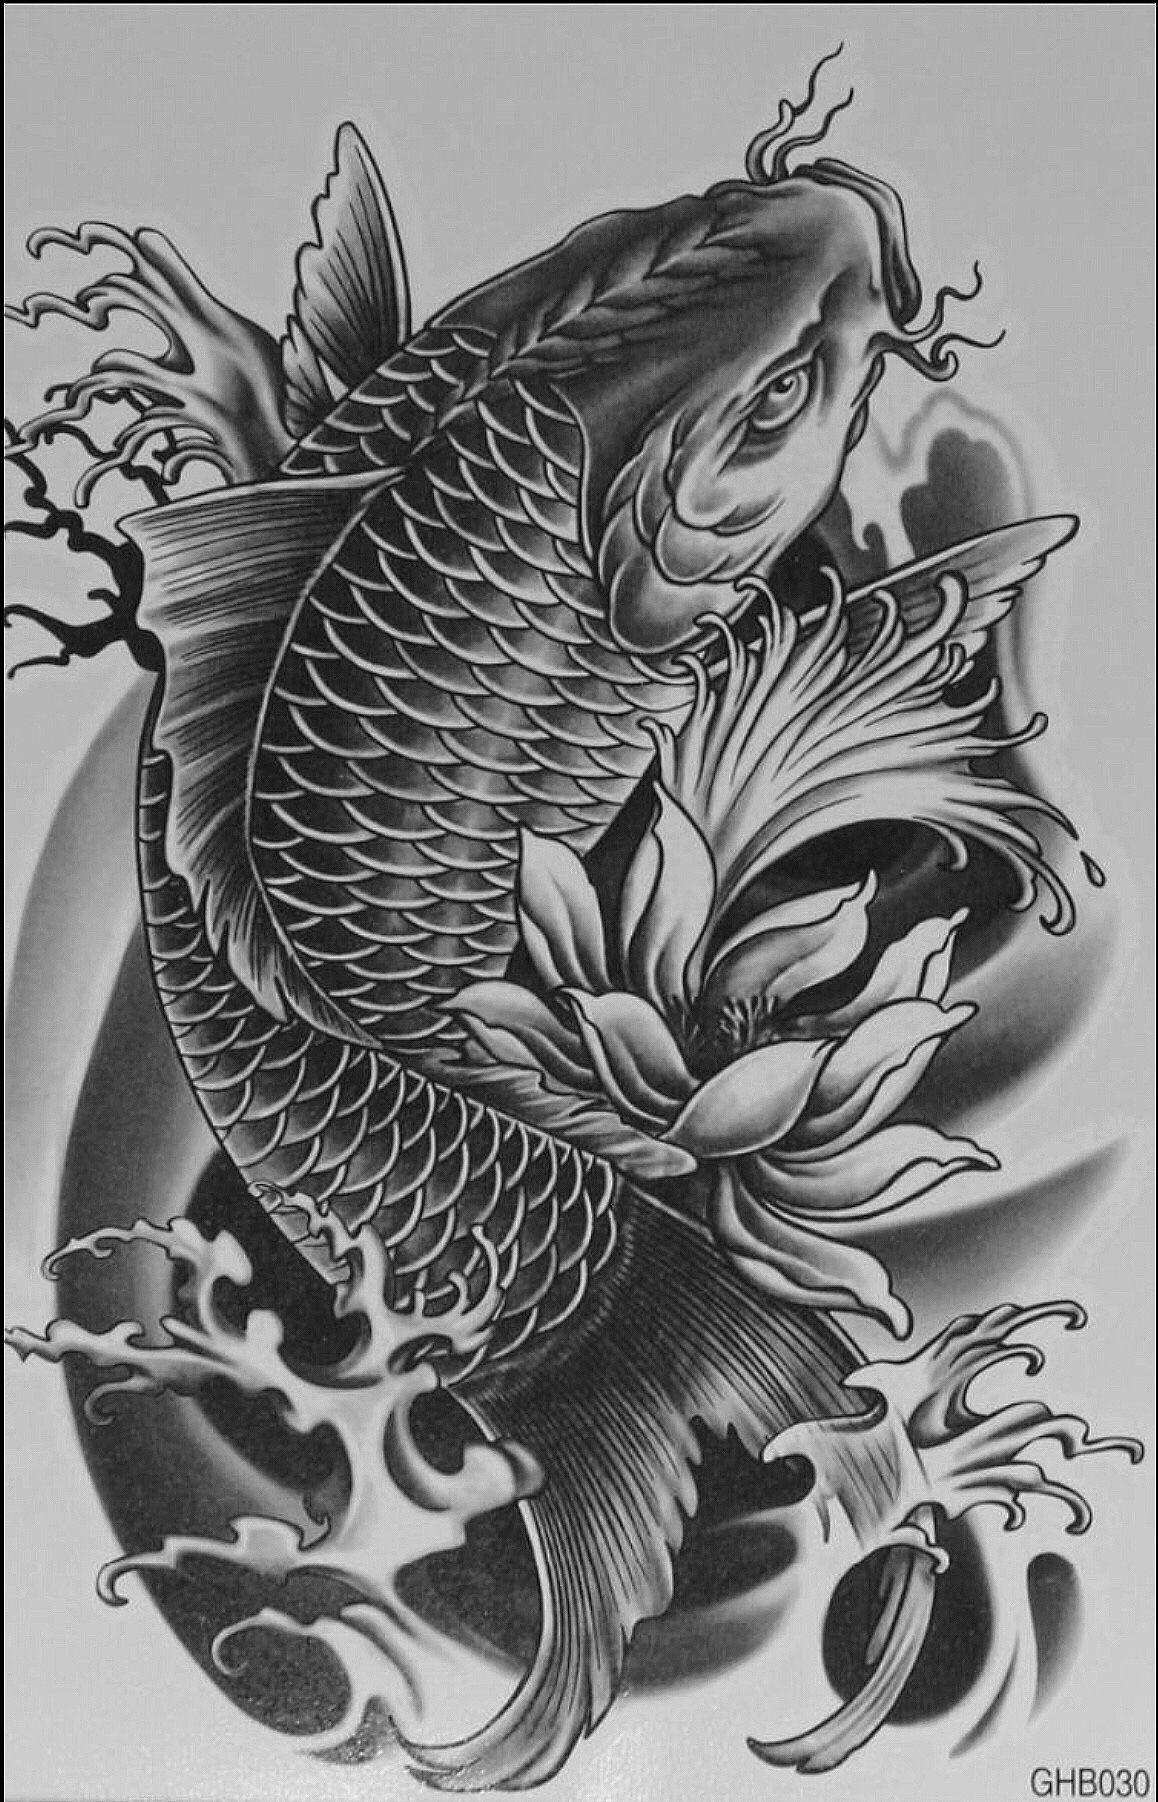 Koi Tattoo Design Tattoos And Body Art Body Tattoos Tattoosandbodyart Koi Dragon Tattoo Koi Fish Tattoo Koi Tattoo